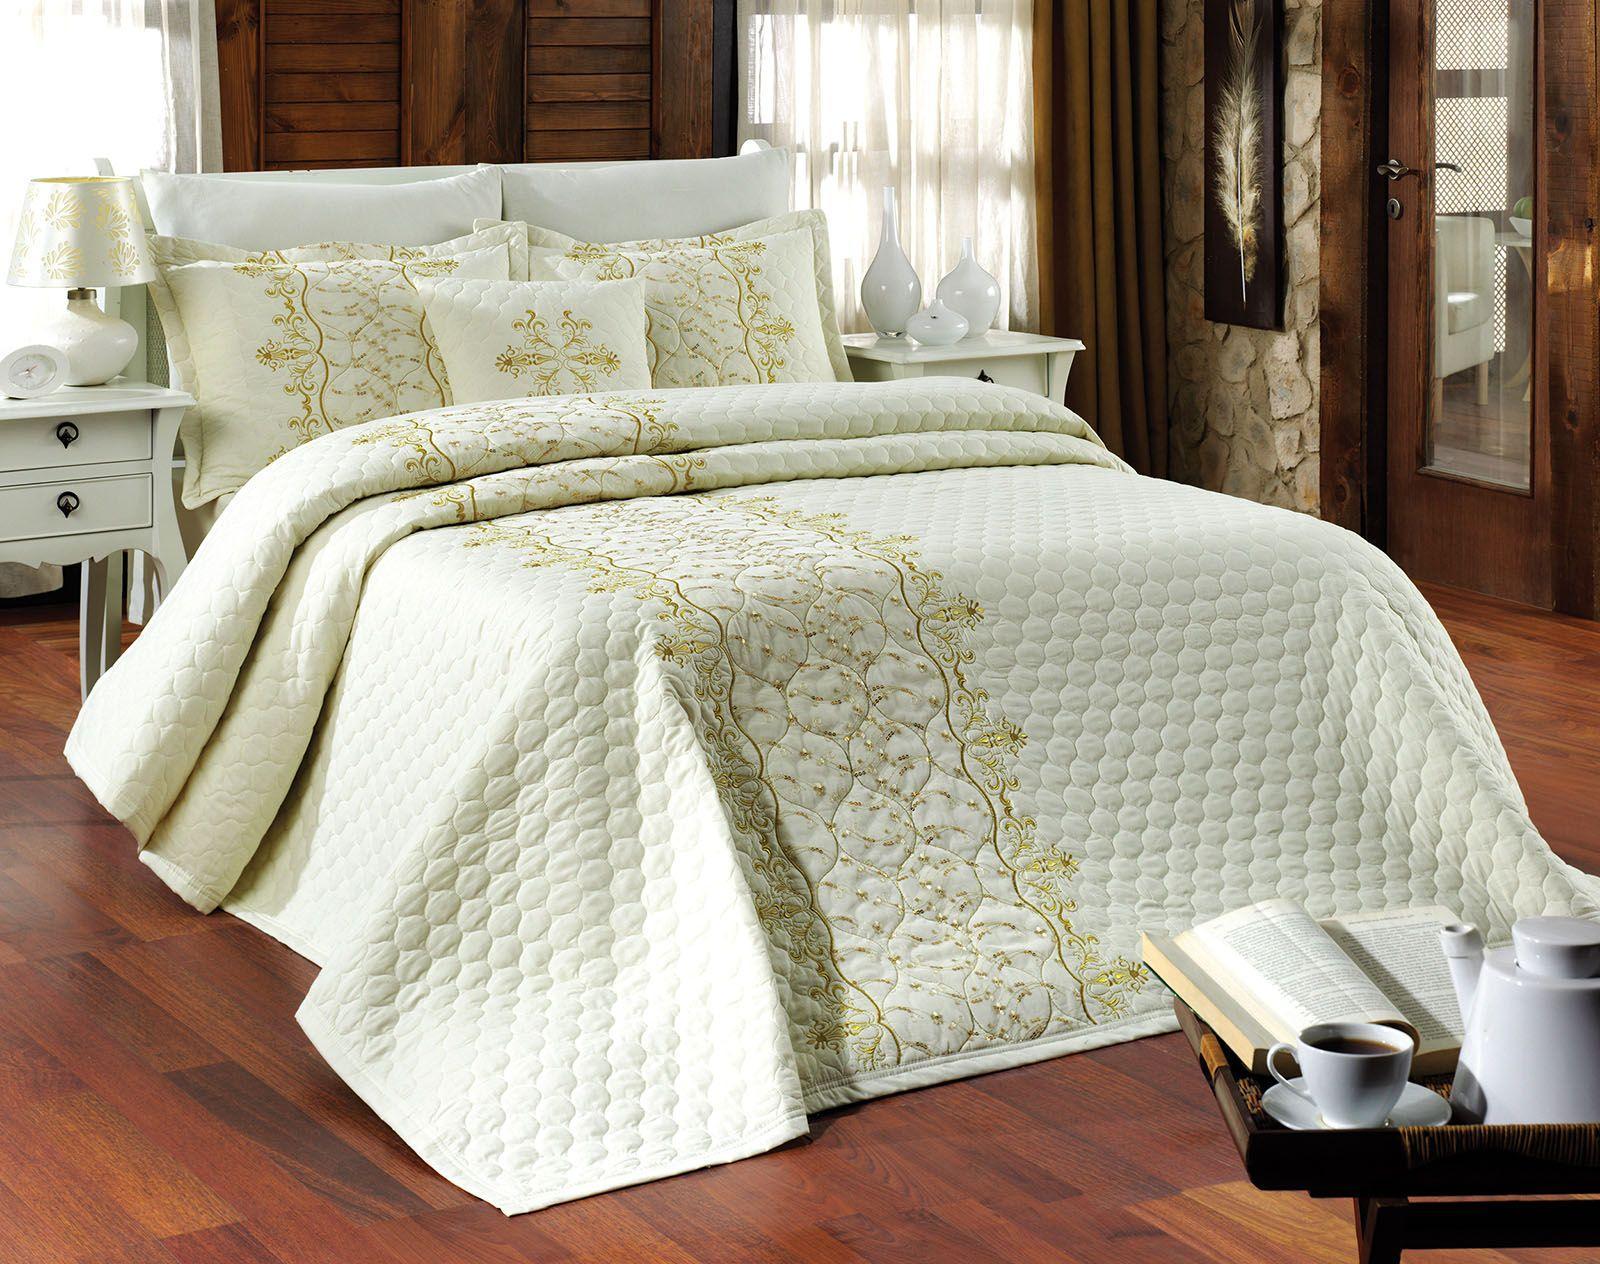 cok amacli cift tarafli yatak ortusu modelleri